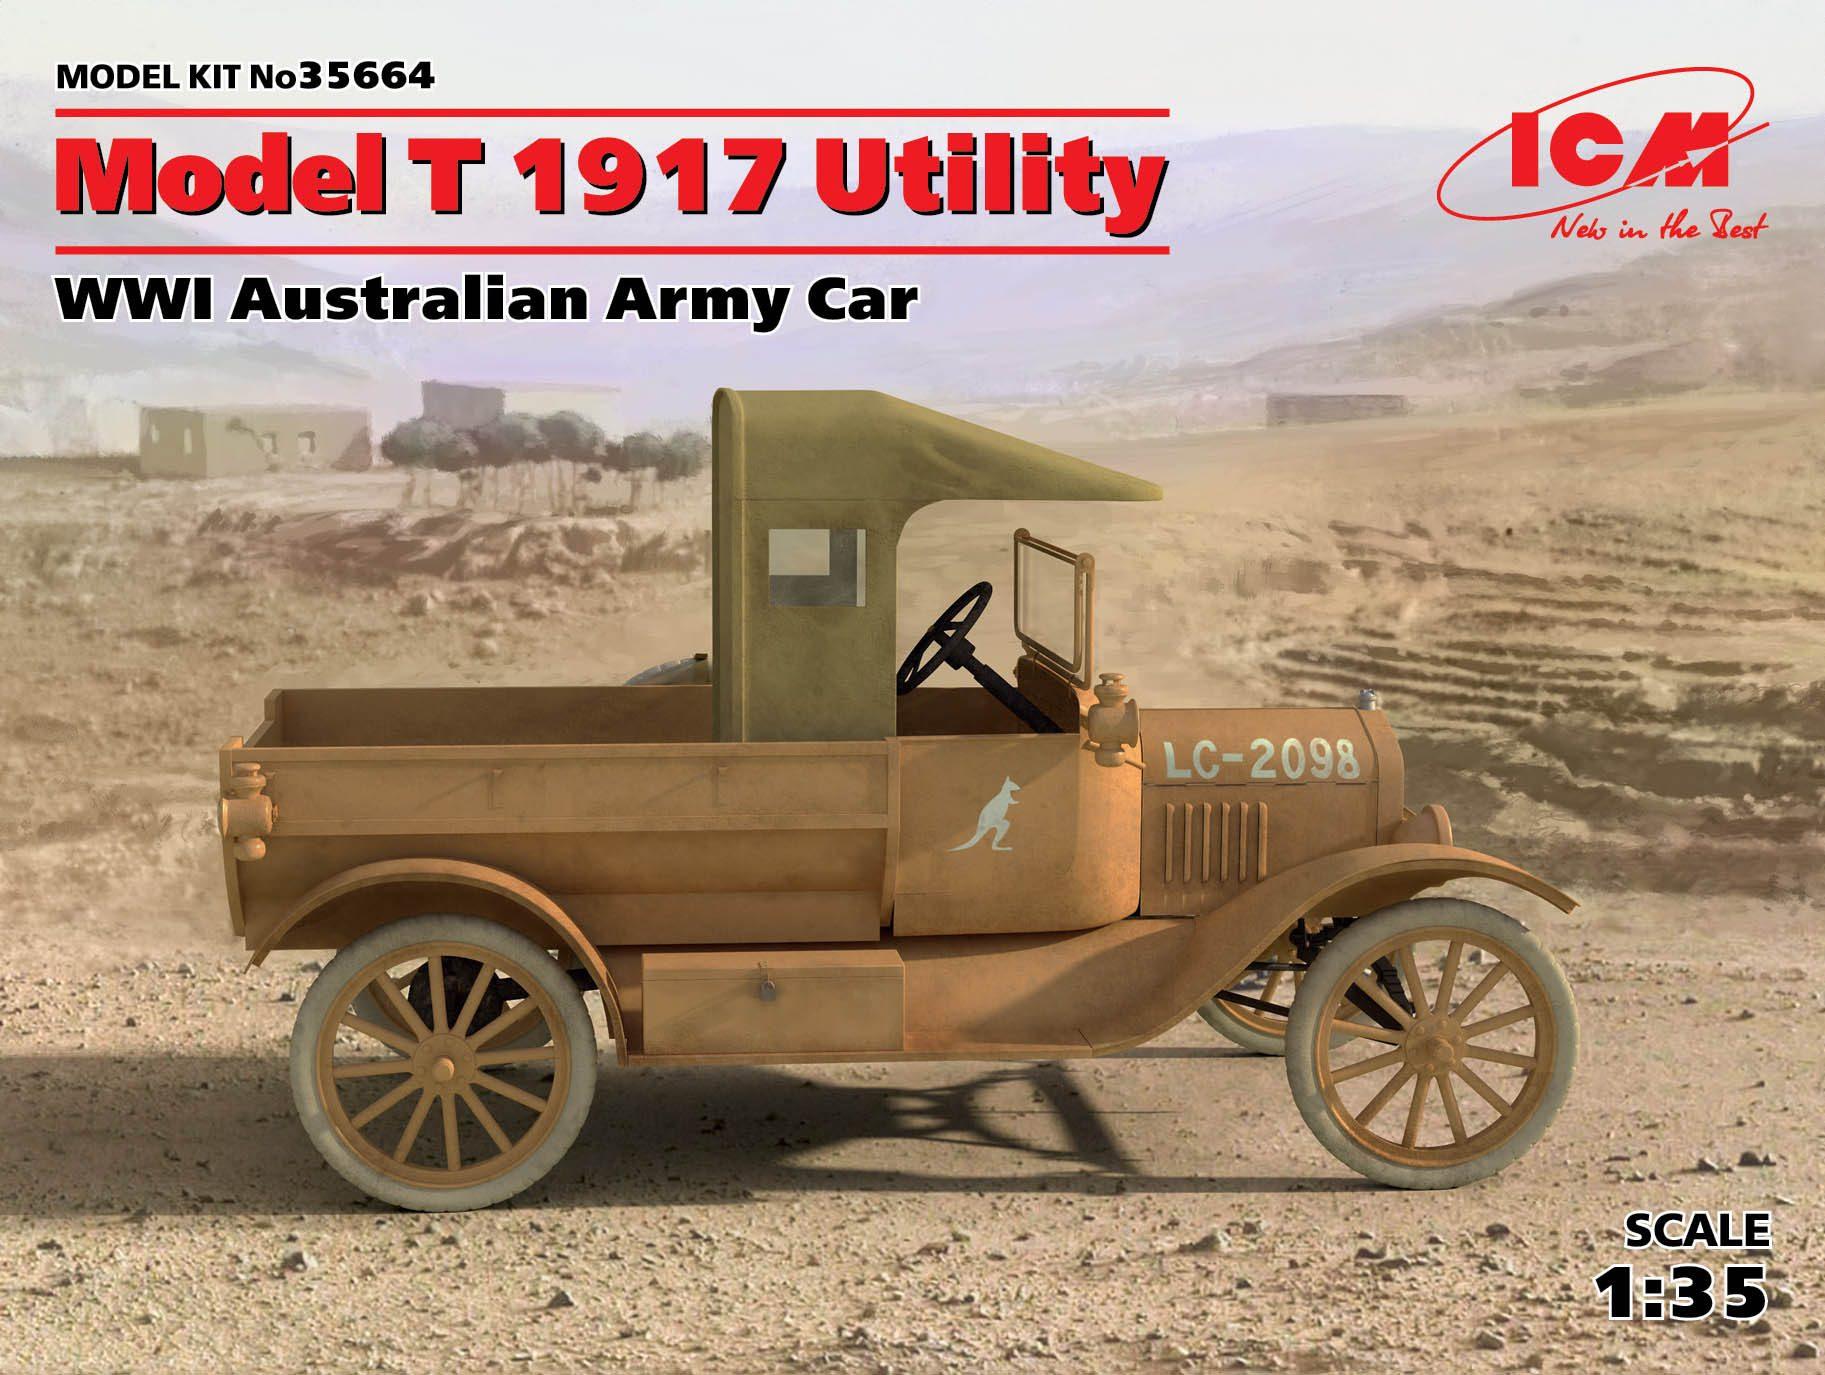 ICM Model T 1917 Utility, WWI Australian Army Car